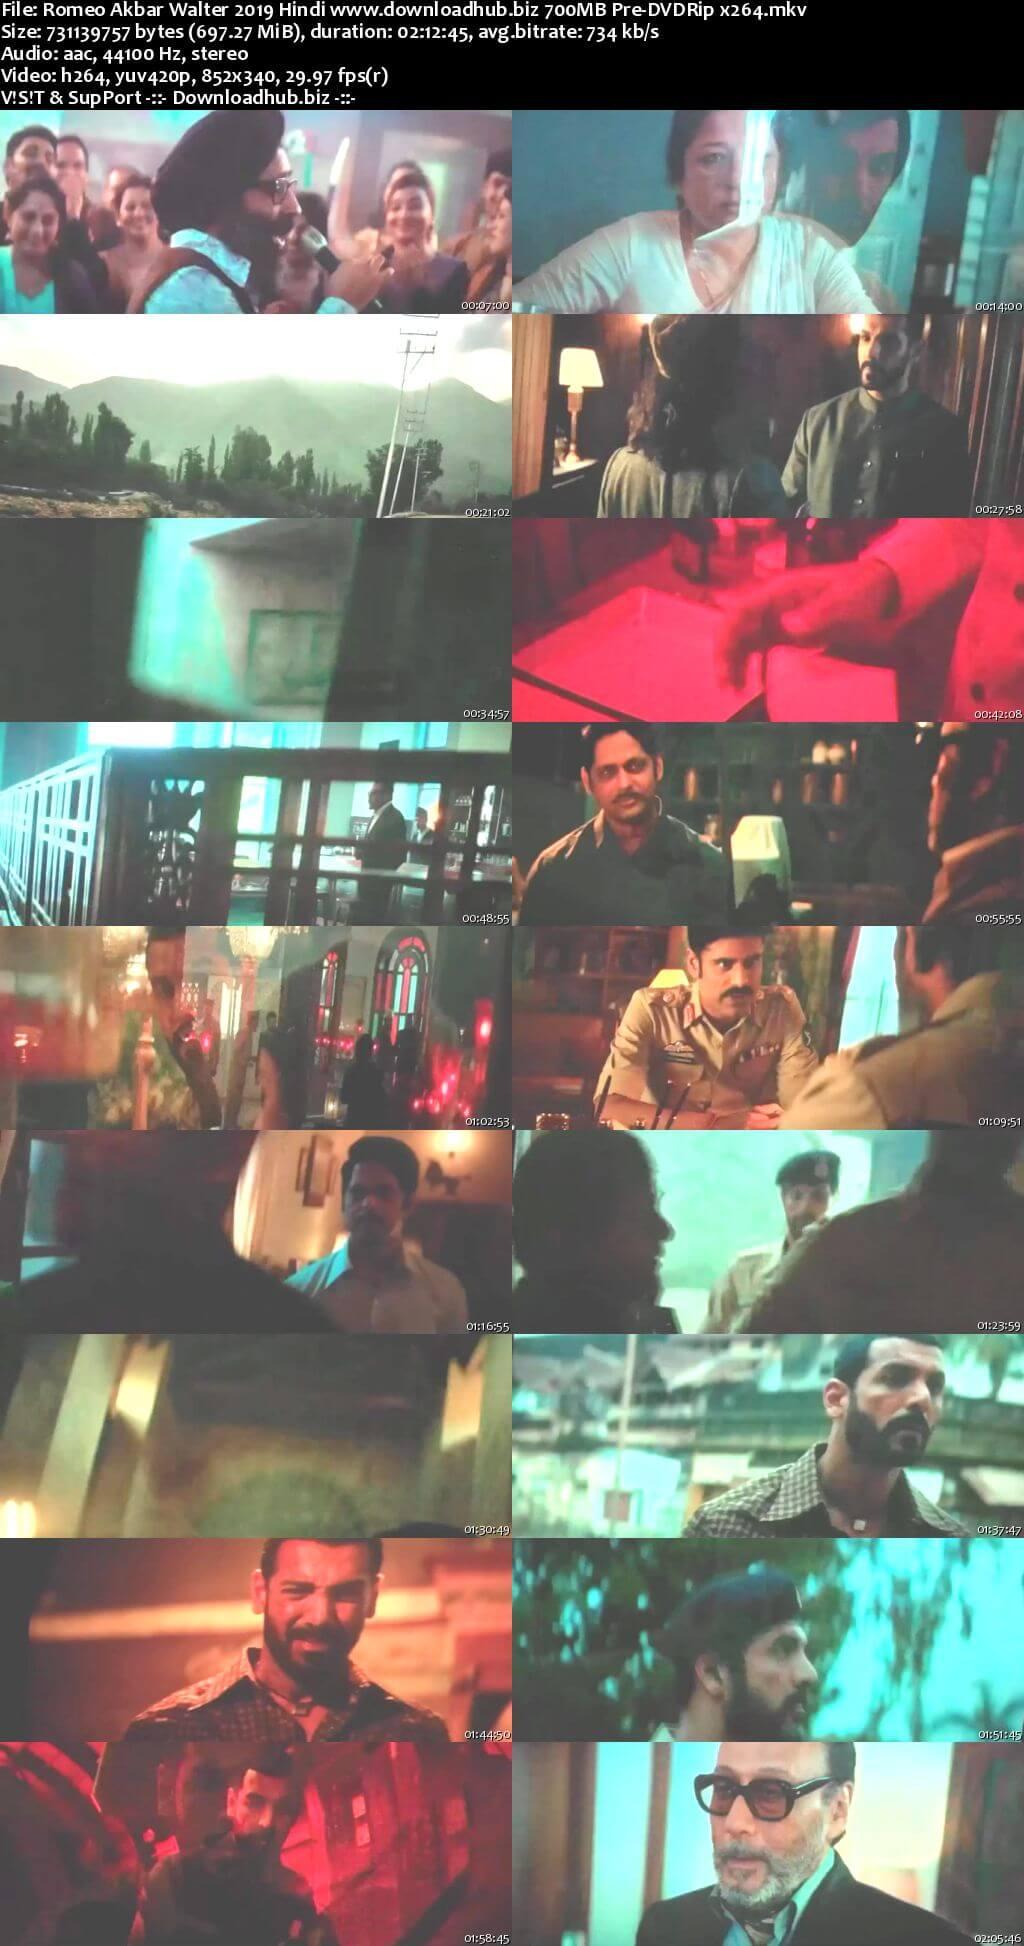 Romeo Akbar Walter 2019 Hindi 700MB Pre-DVDRip x264